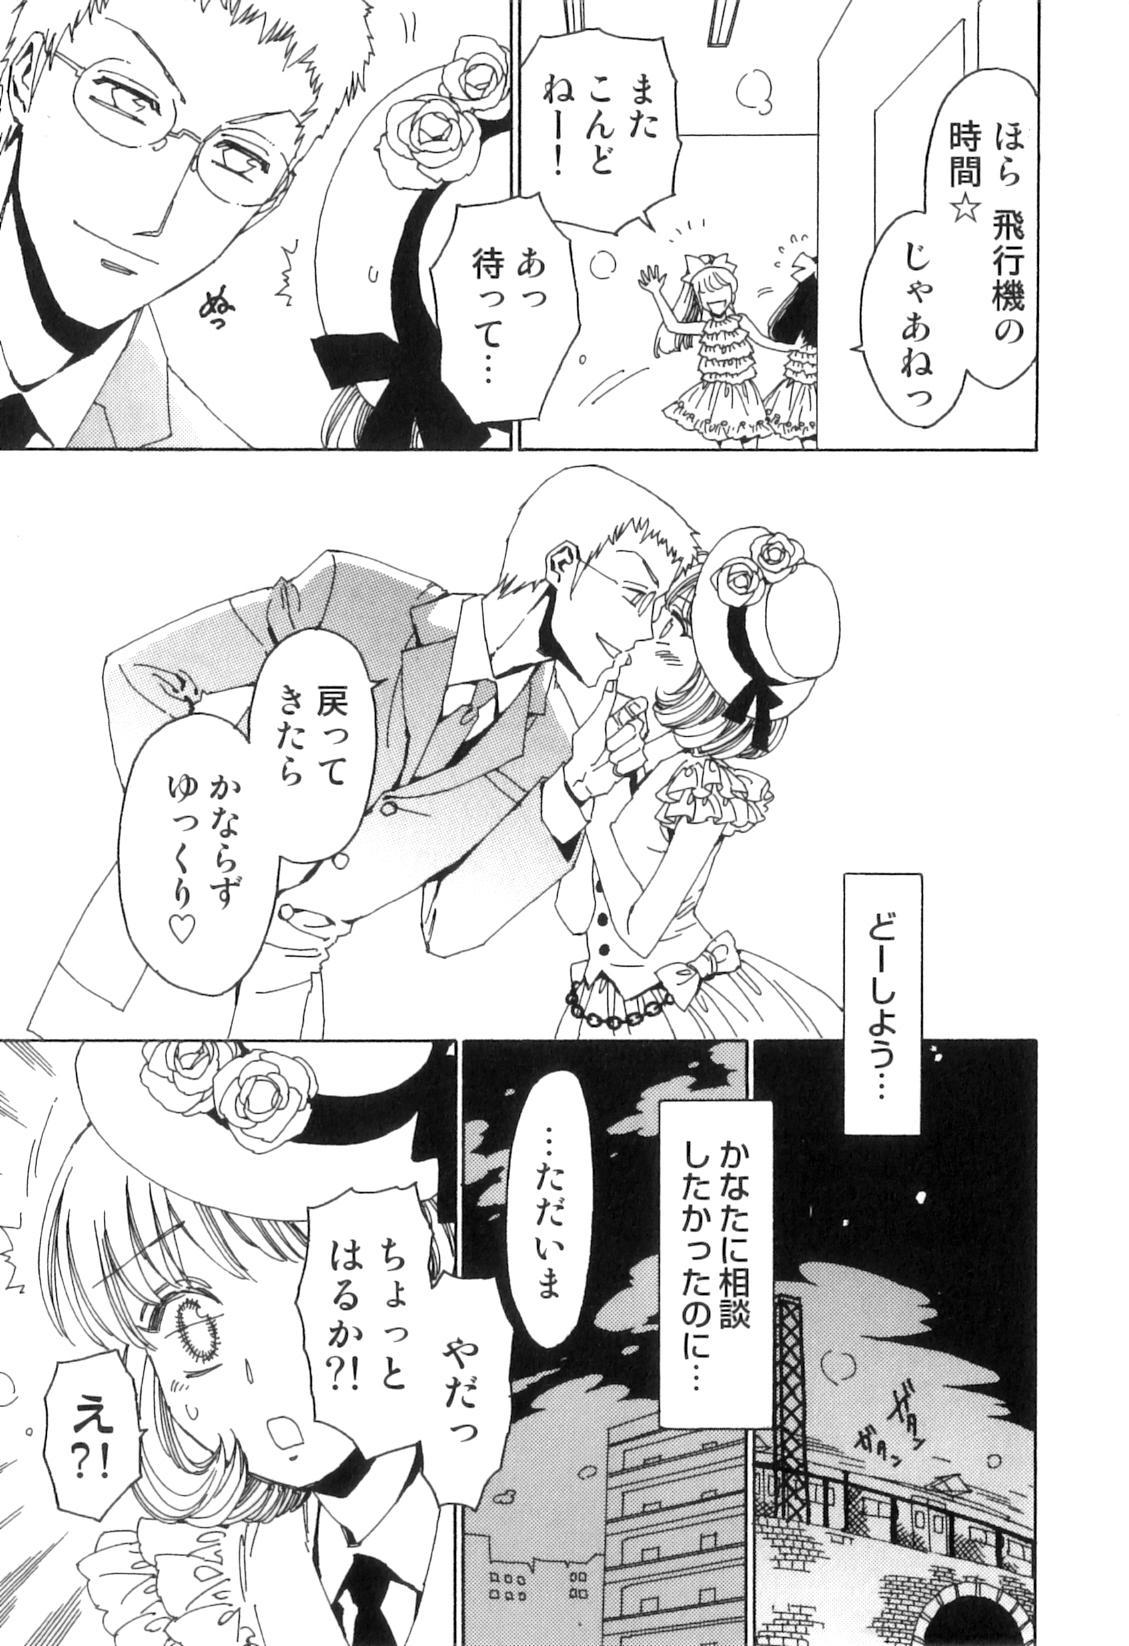 Yuni-Hapi 37